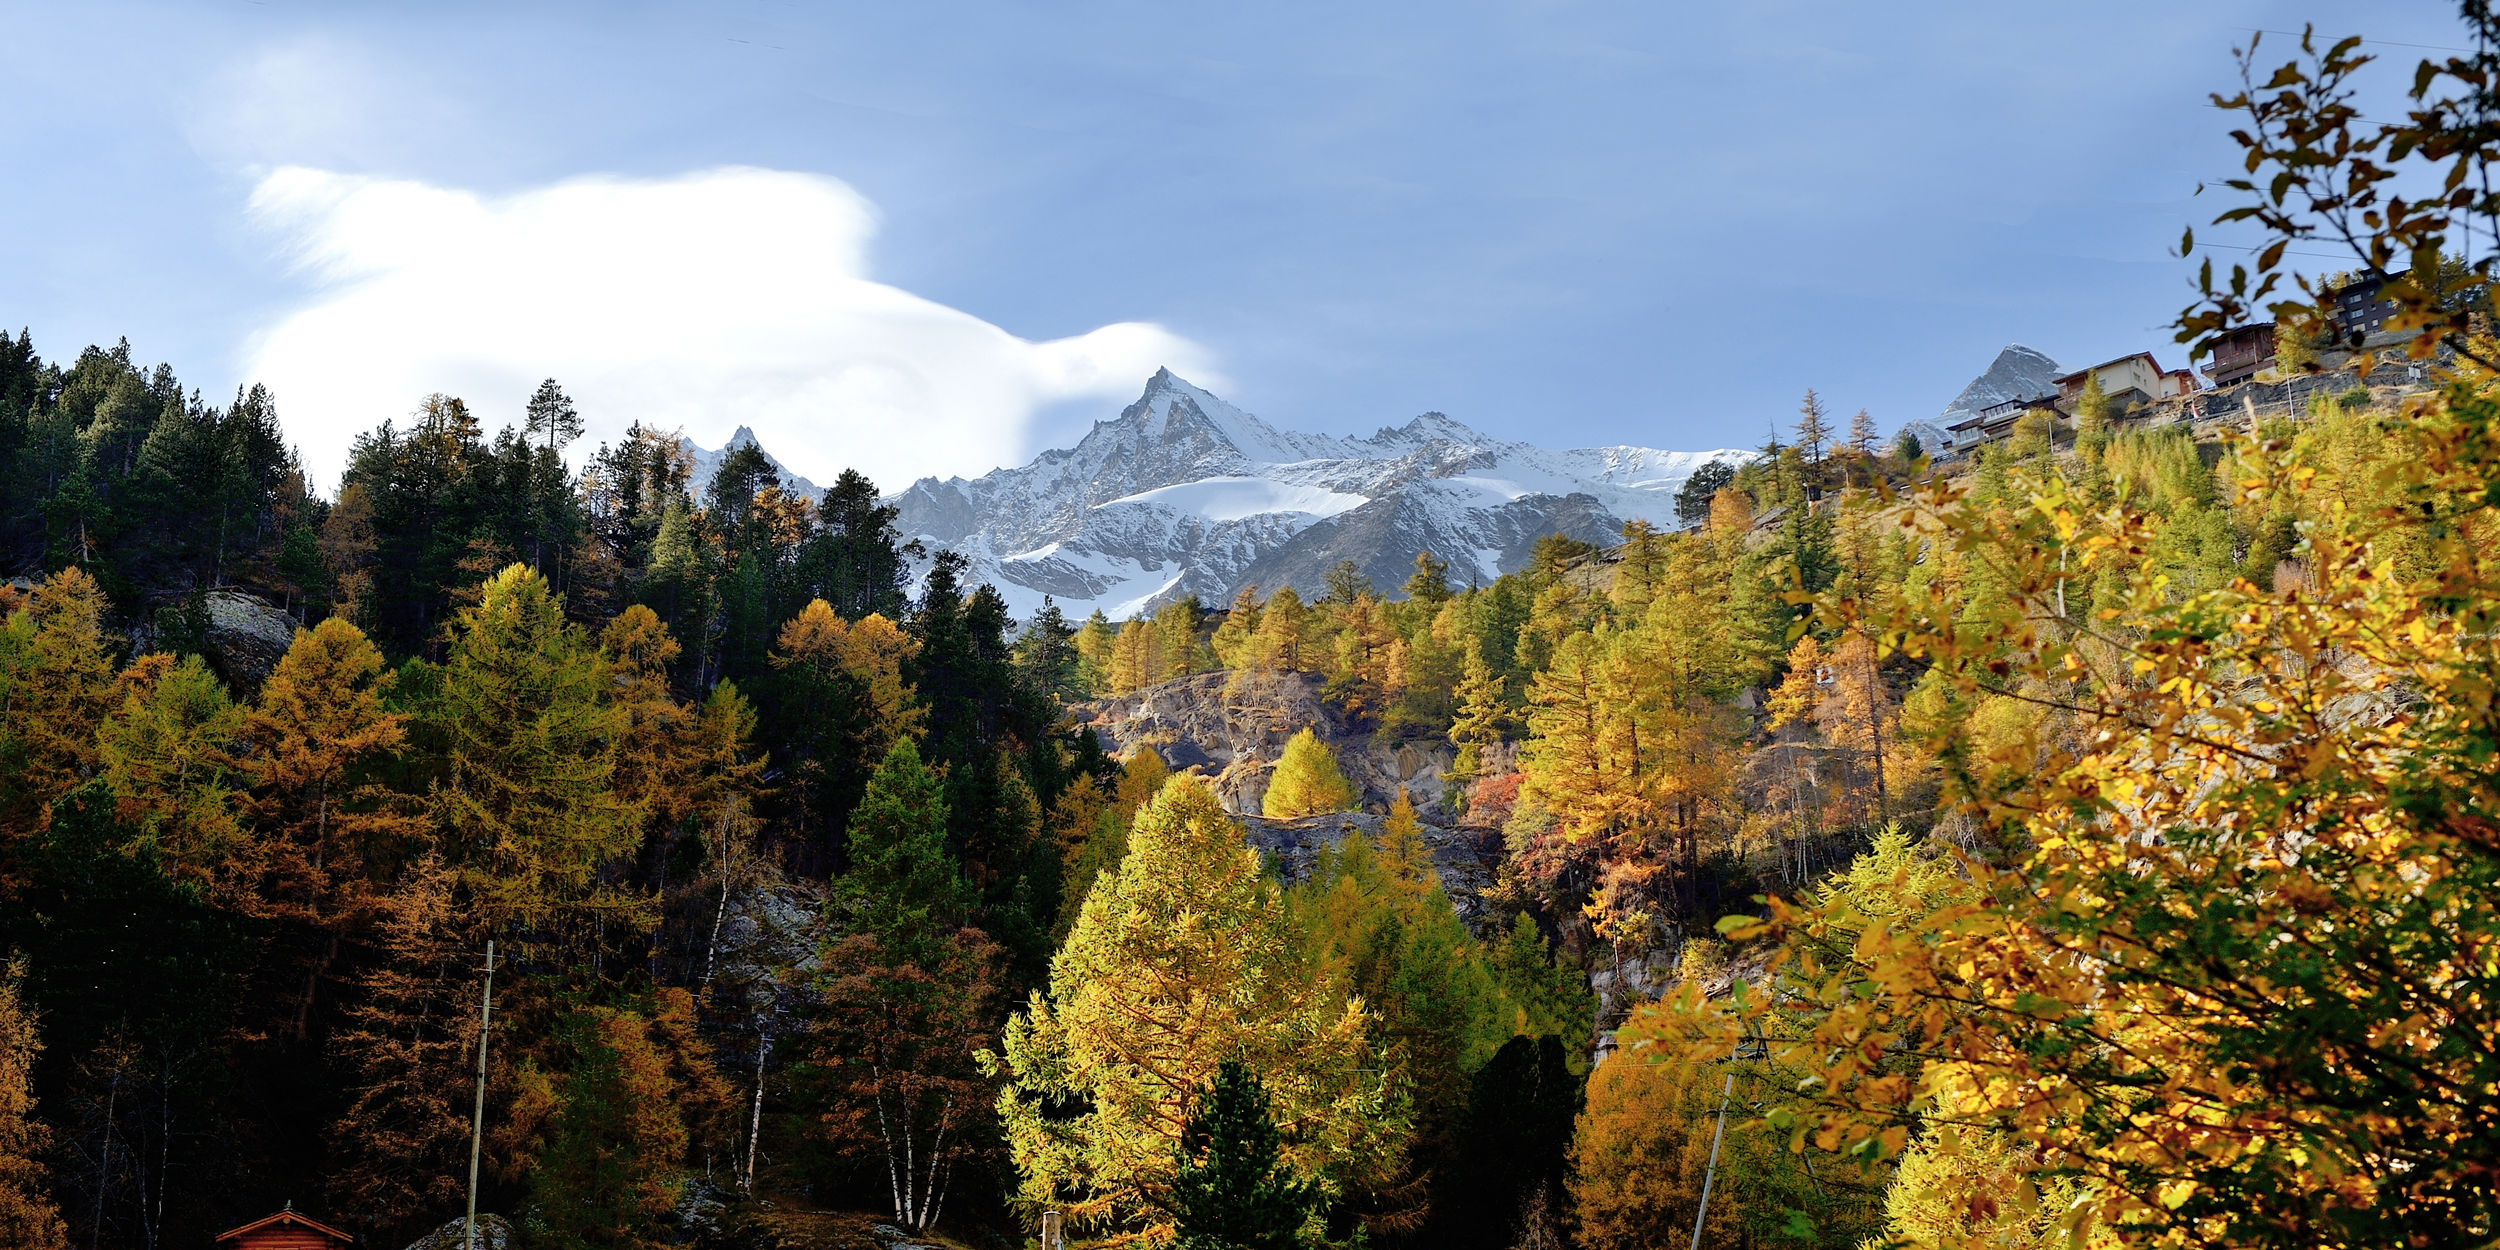 Herbst in der Freien Ferienrepublik Saas-Fee